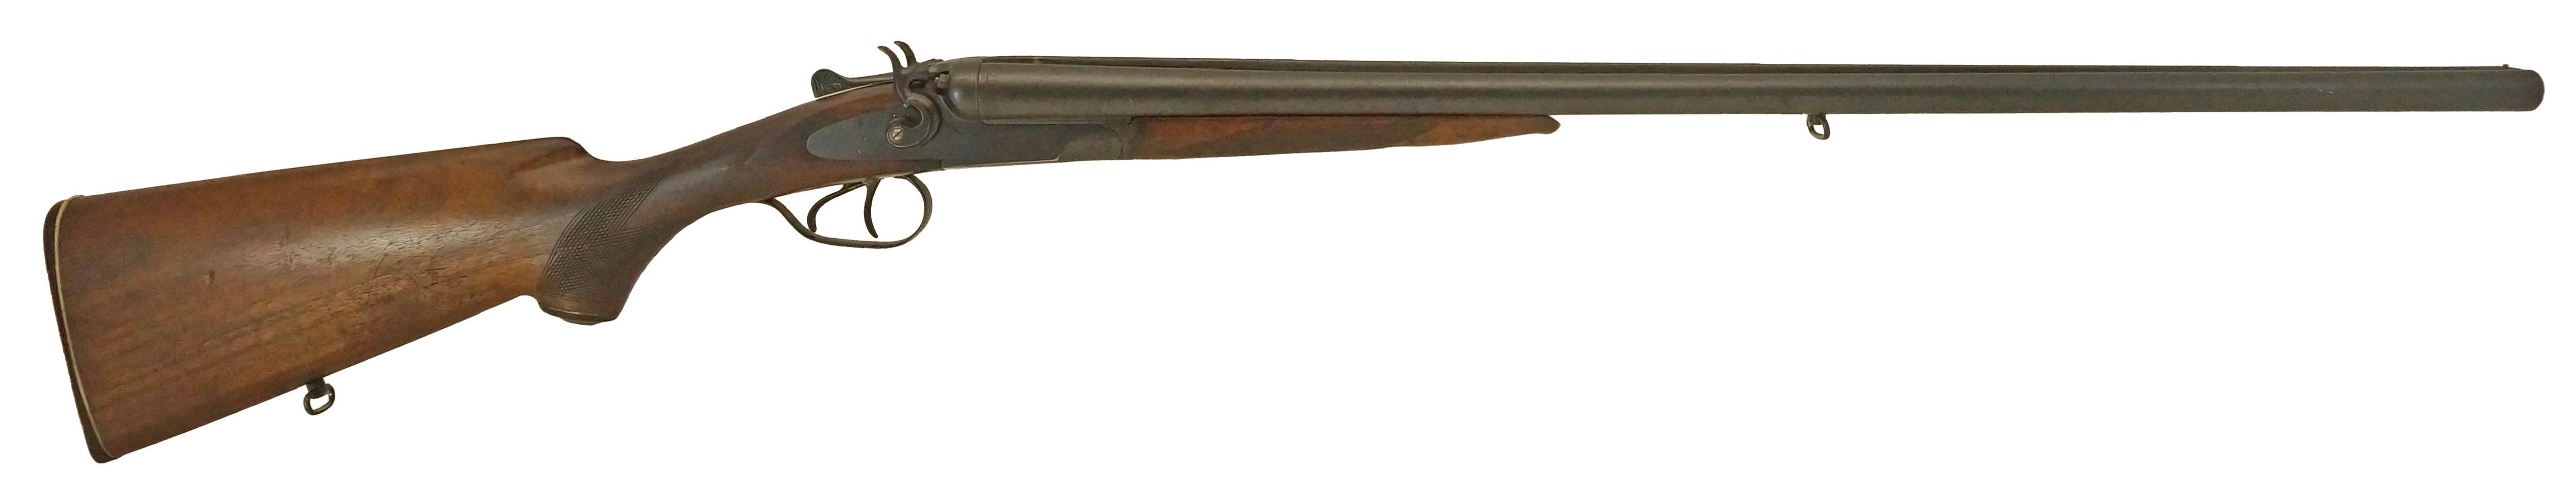 "Tula TOZ-63, 16GA, 28"" Barrel, *Good, Cracked Stock*"